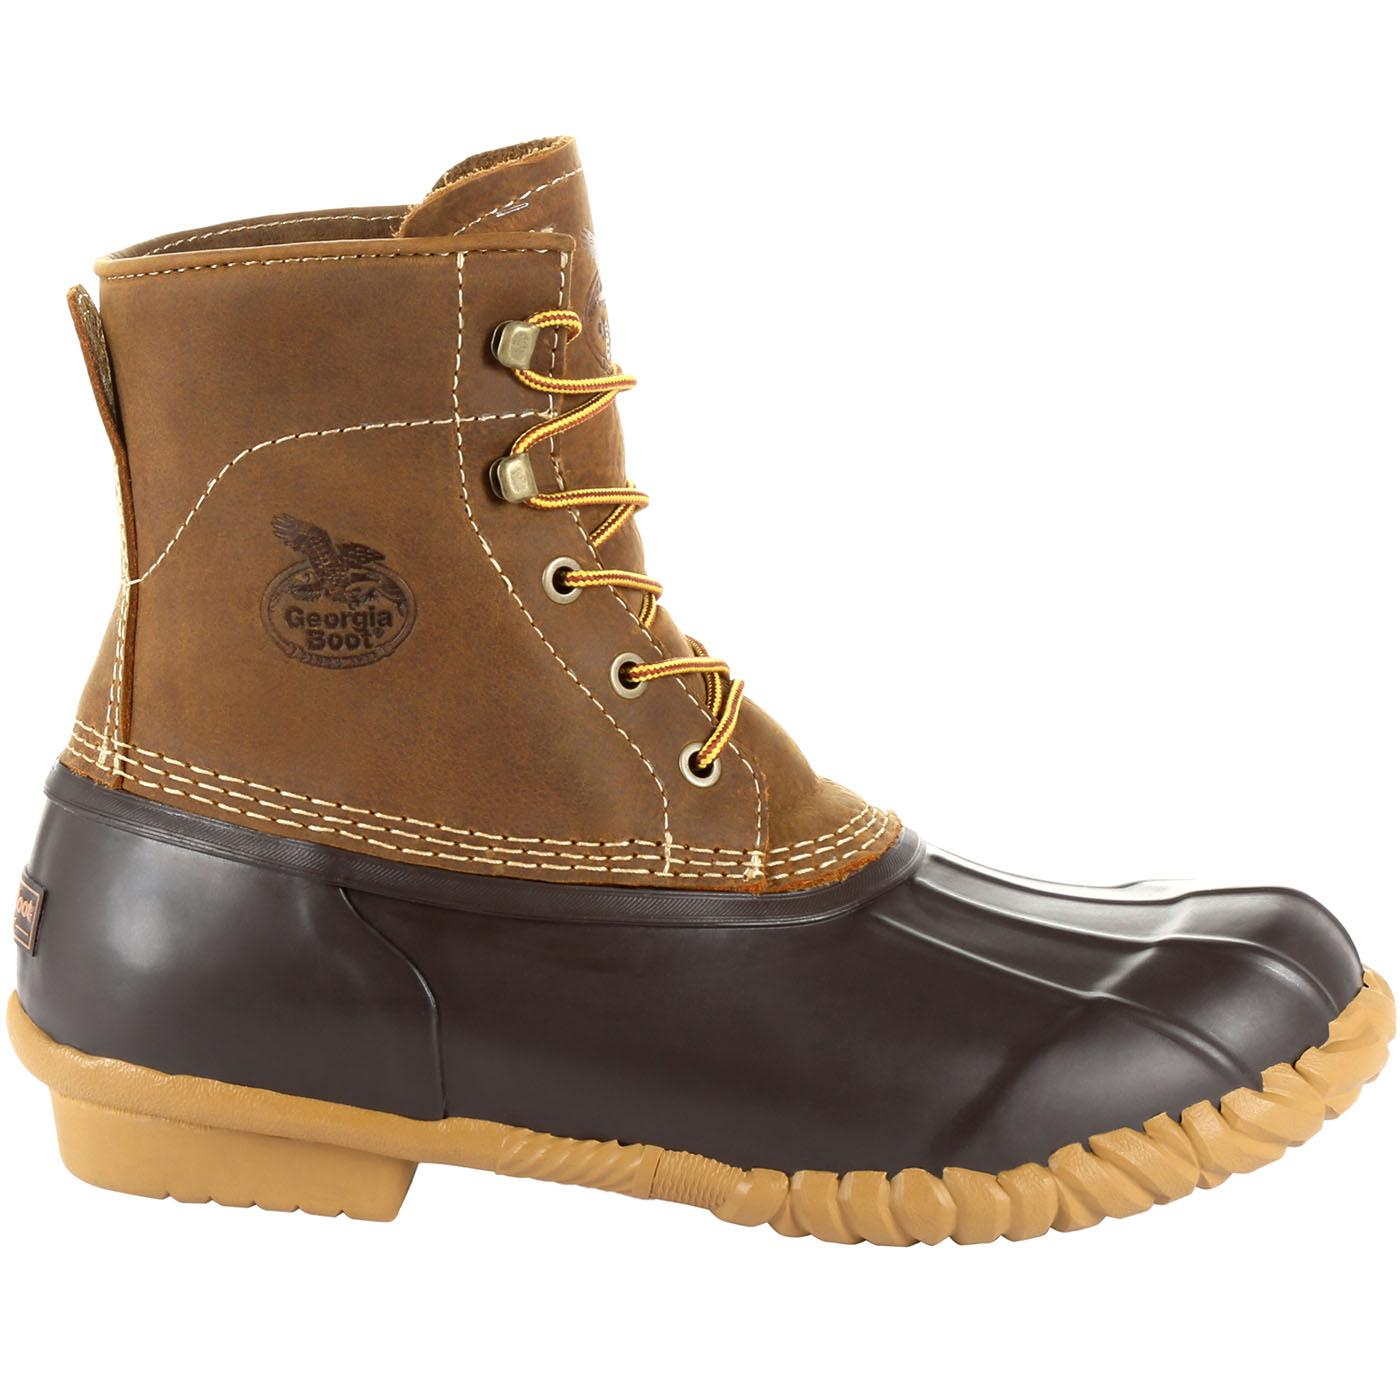 b11c6ca20f4 Georgia Boot Marshland Unisex Duck Boot